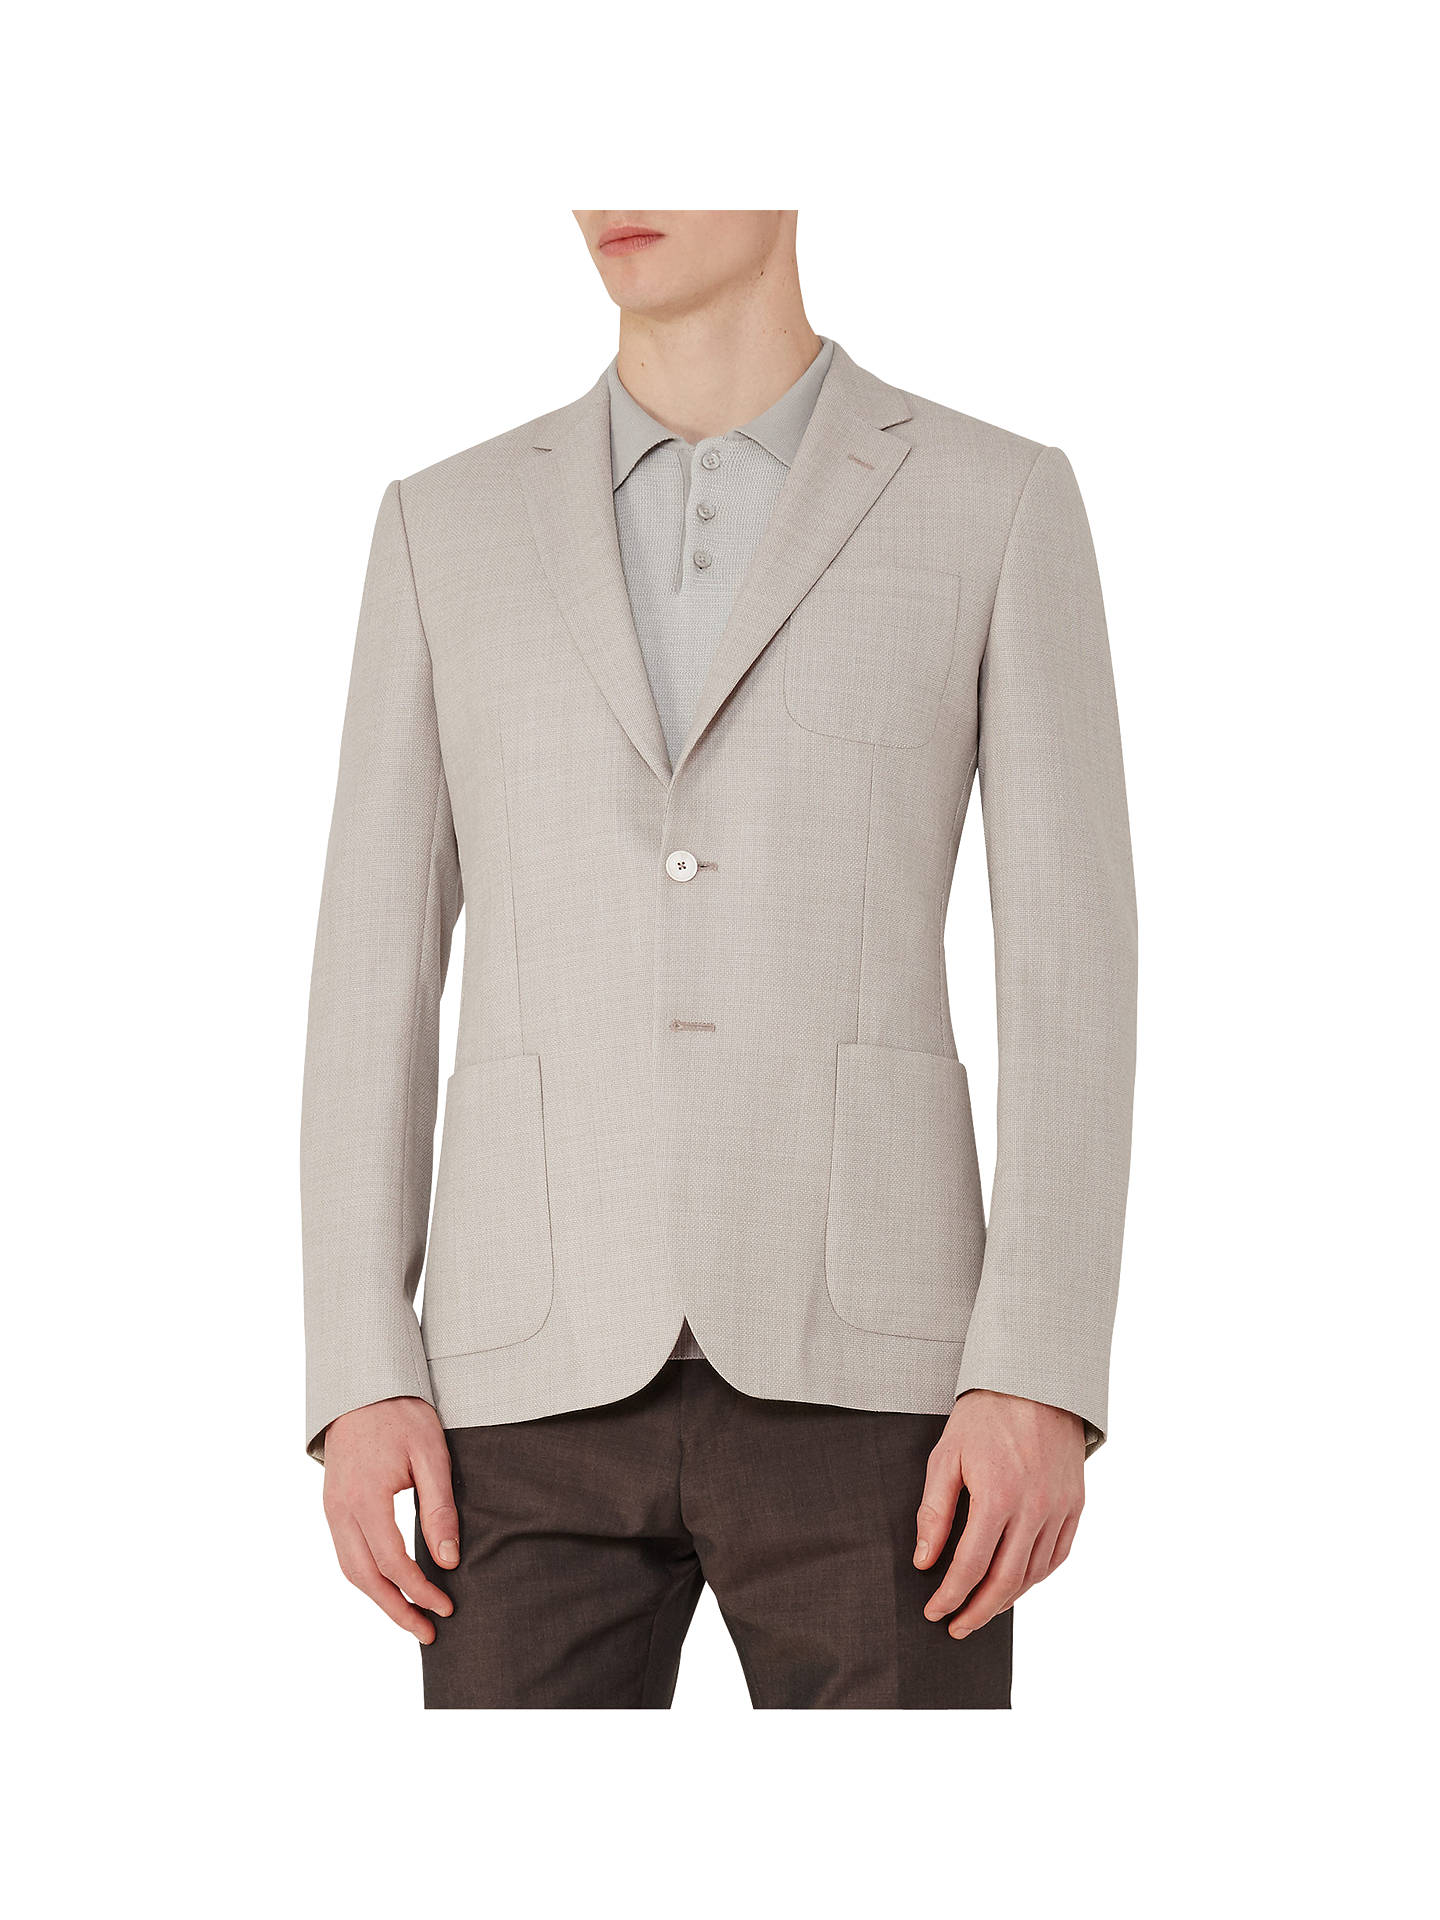 b011aaa9d4 Reiss Blaine Hopsack Wool Modern Fit Blazer, Stone at John Lewis ...